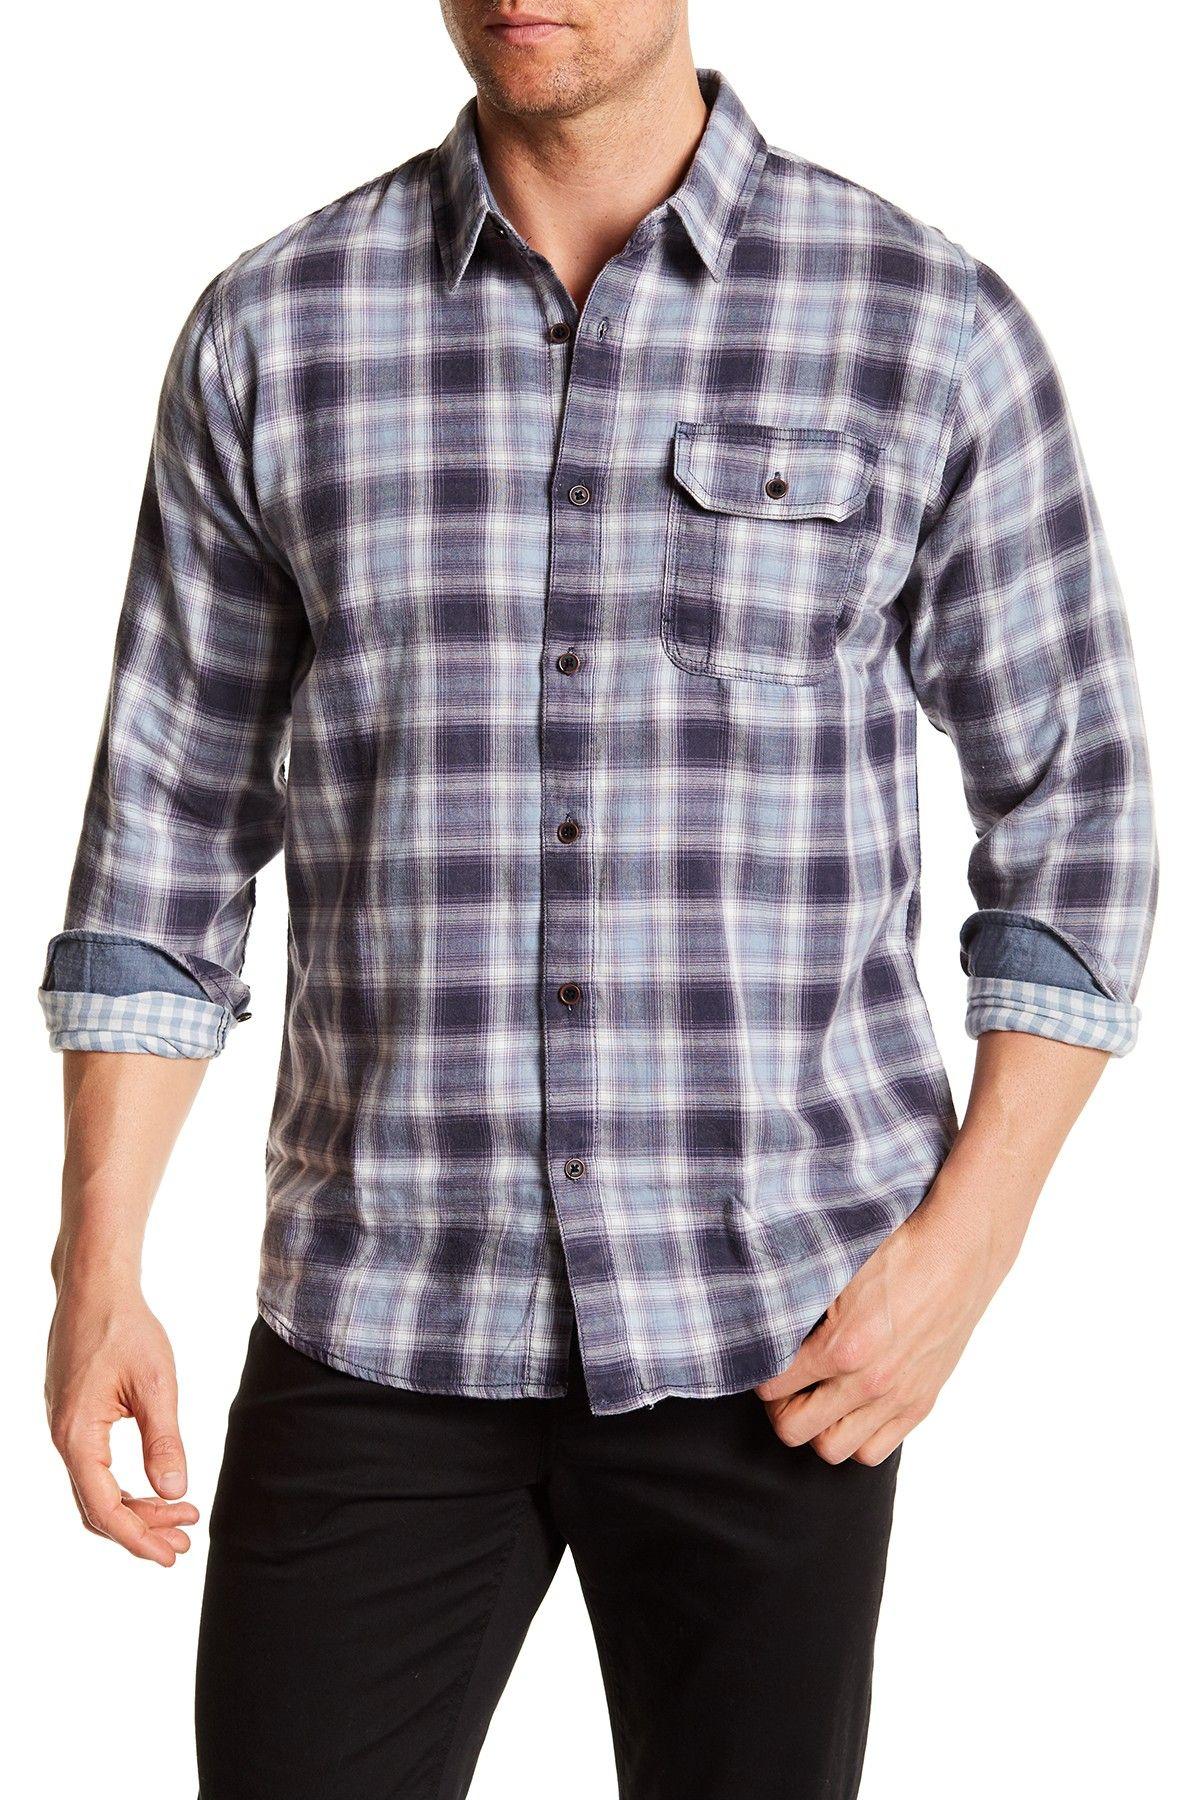 Flannel shirt ideas  PX Terrance Regular Fit Washed Flannel Shirt  Menus Fashion Dressy